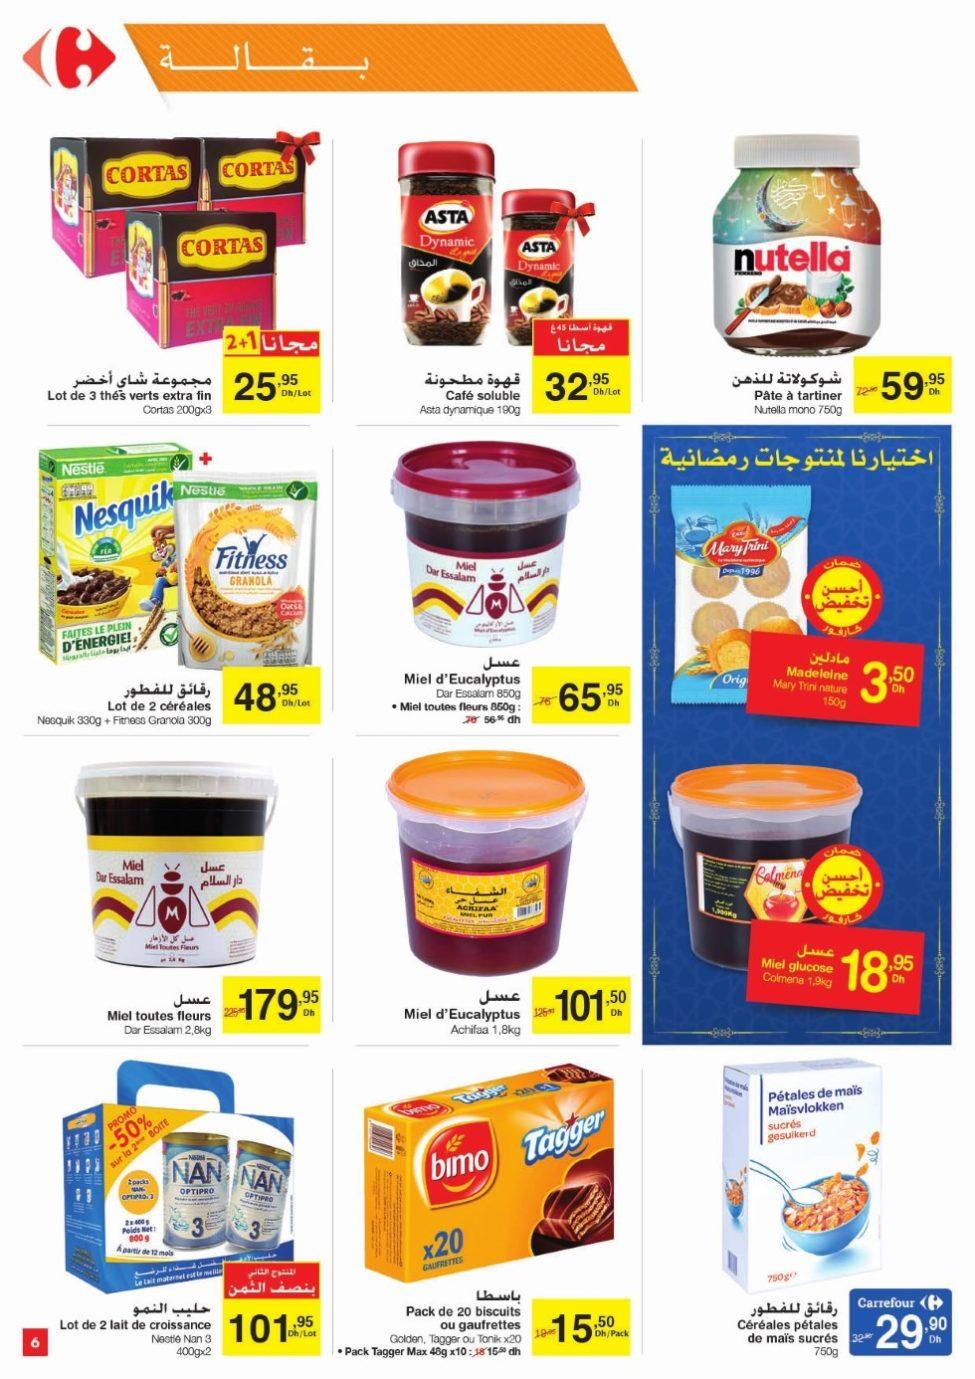 Catalogue Carrefour Market Maroc عواشر مبروكة du 18 Avril au 1 Mai 2019